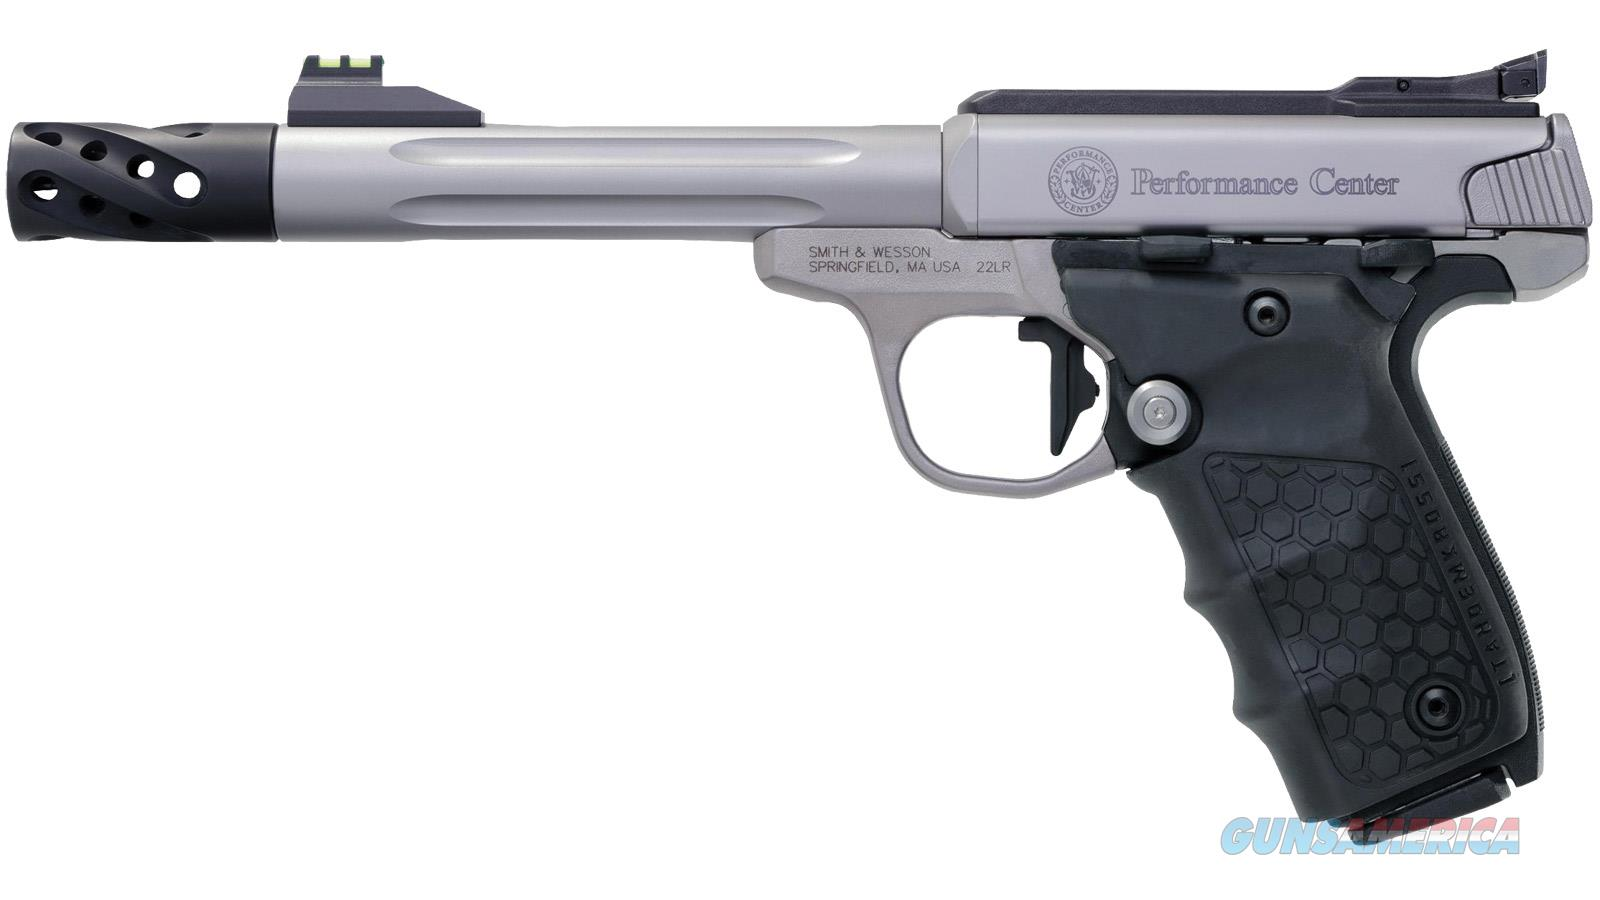 "Smith & Wesson Pc Sw22 Victory 22Lr 6"" 12078  Guns > Pistols > S Misc Pistols"